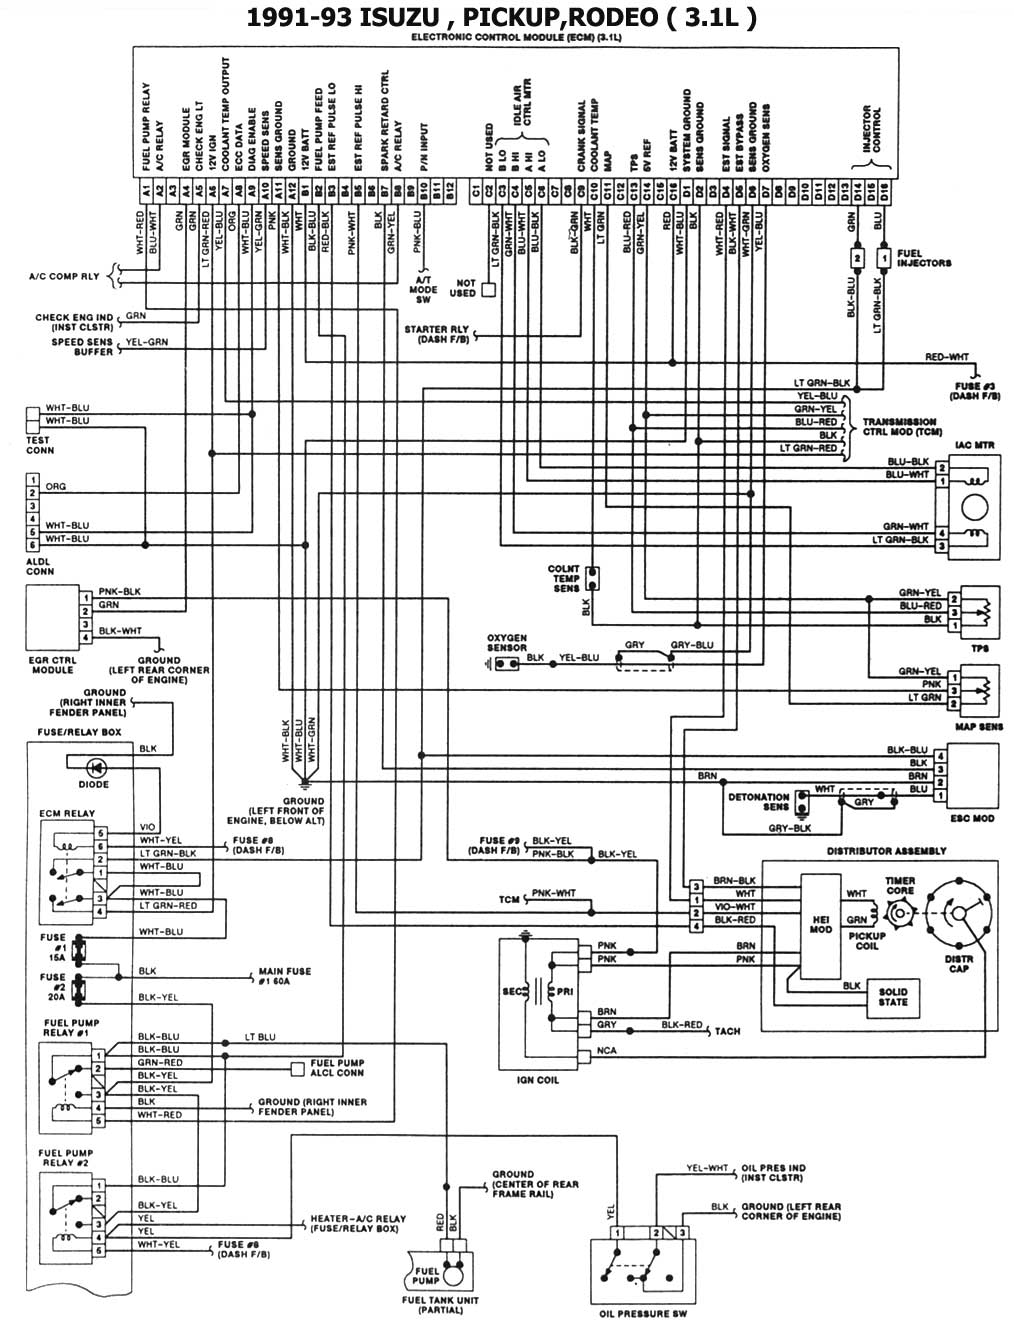 95 Corolla Wiring Diagram Dlc Auto Electrical